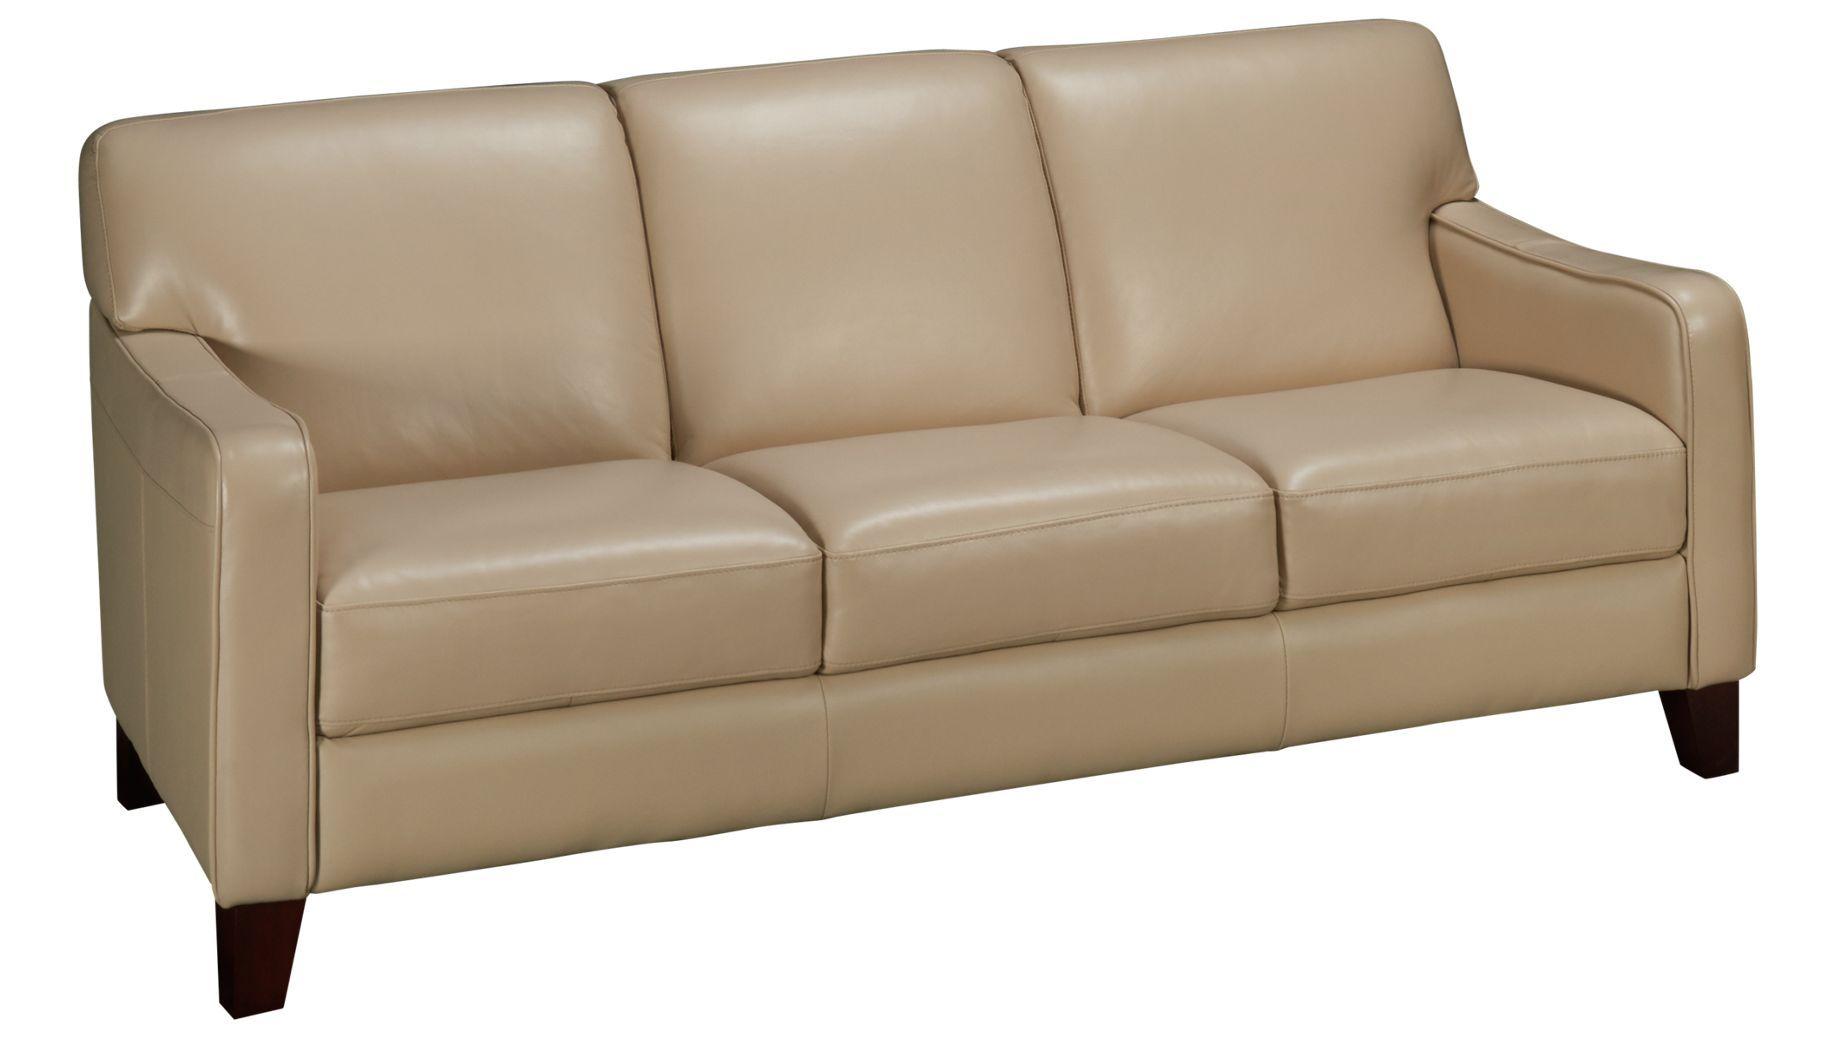 - Futura Leather-Betty-Betty Leather Sofa - Jordan's Furniture (With